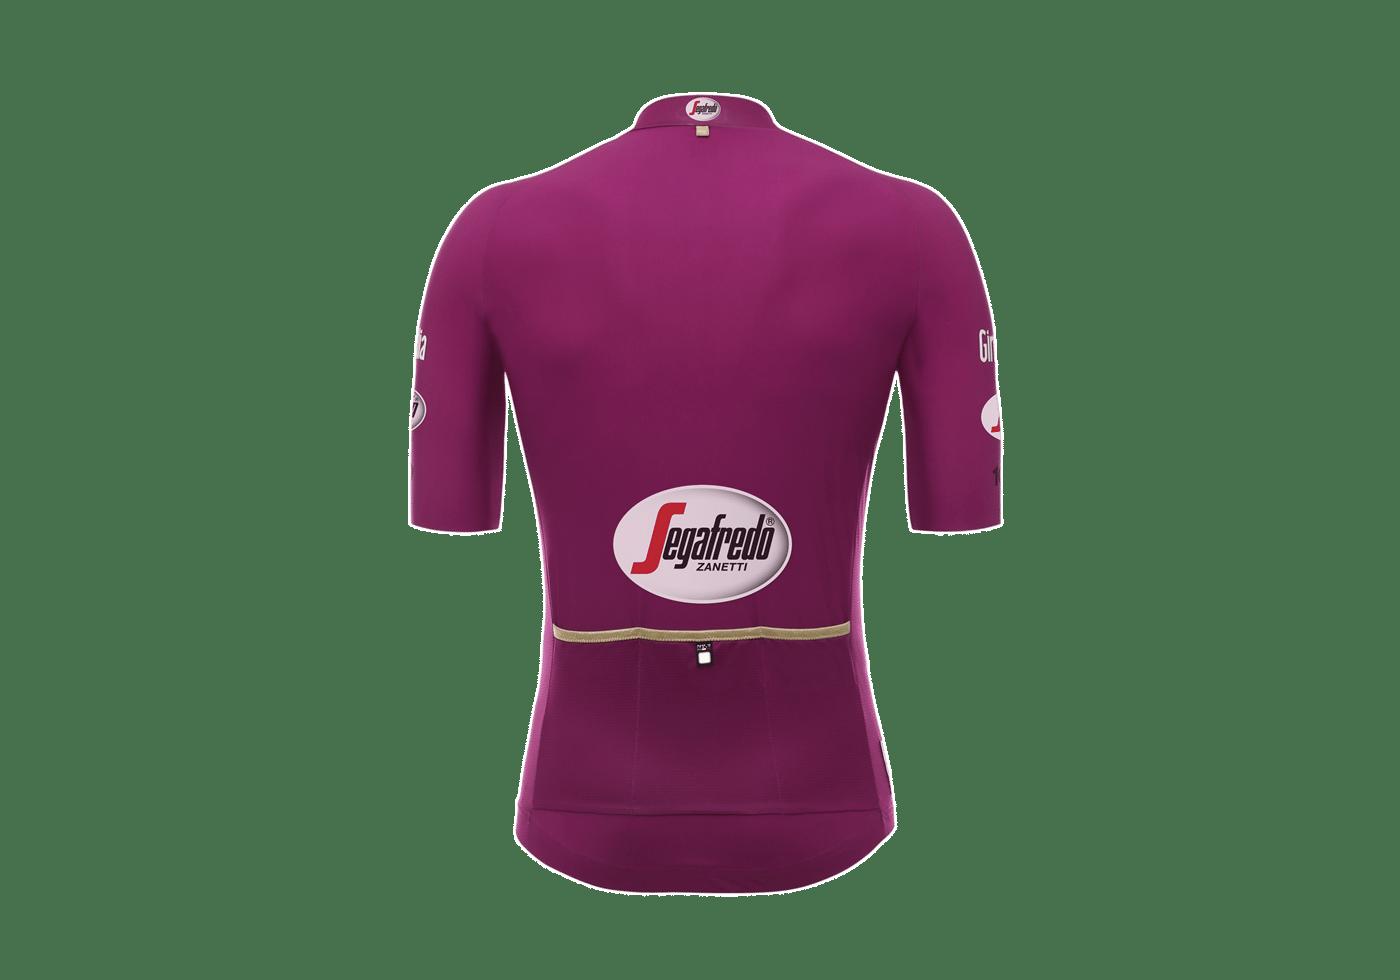 Maglia Roja Giro de Italia 2017 II